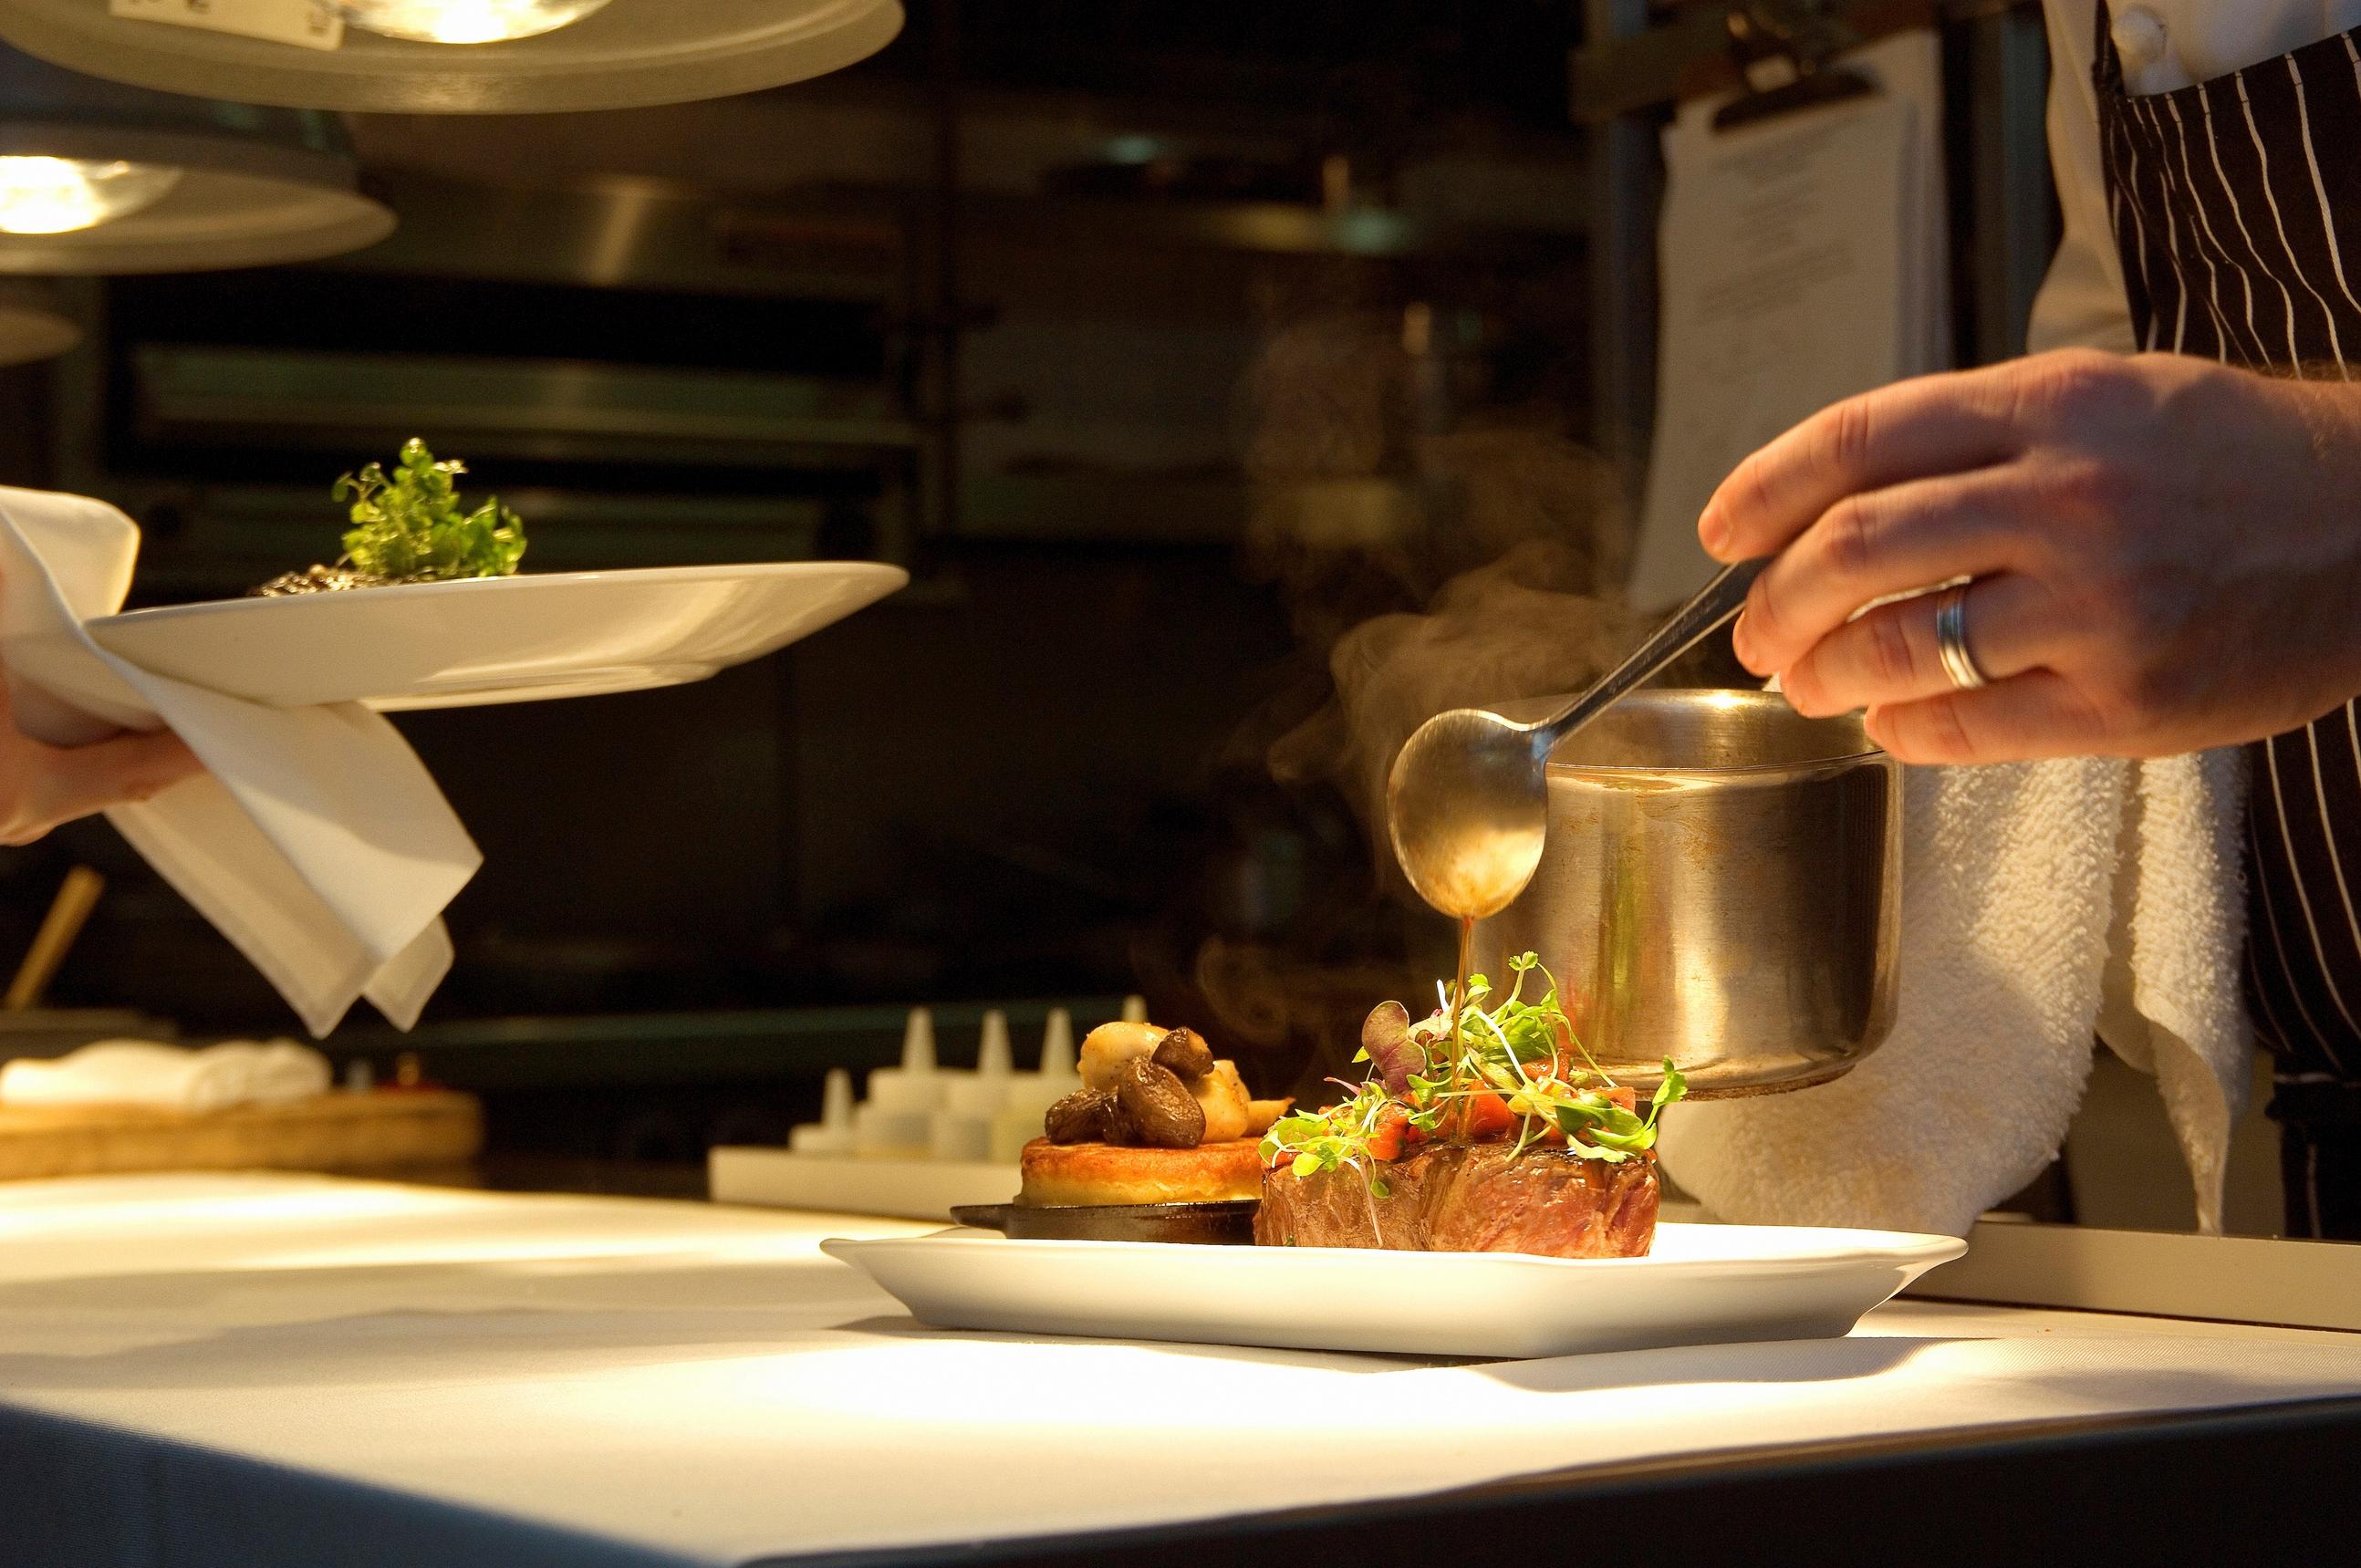 Culinary Arts Certificate Northeast Texas Community College